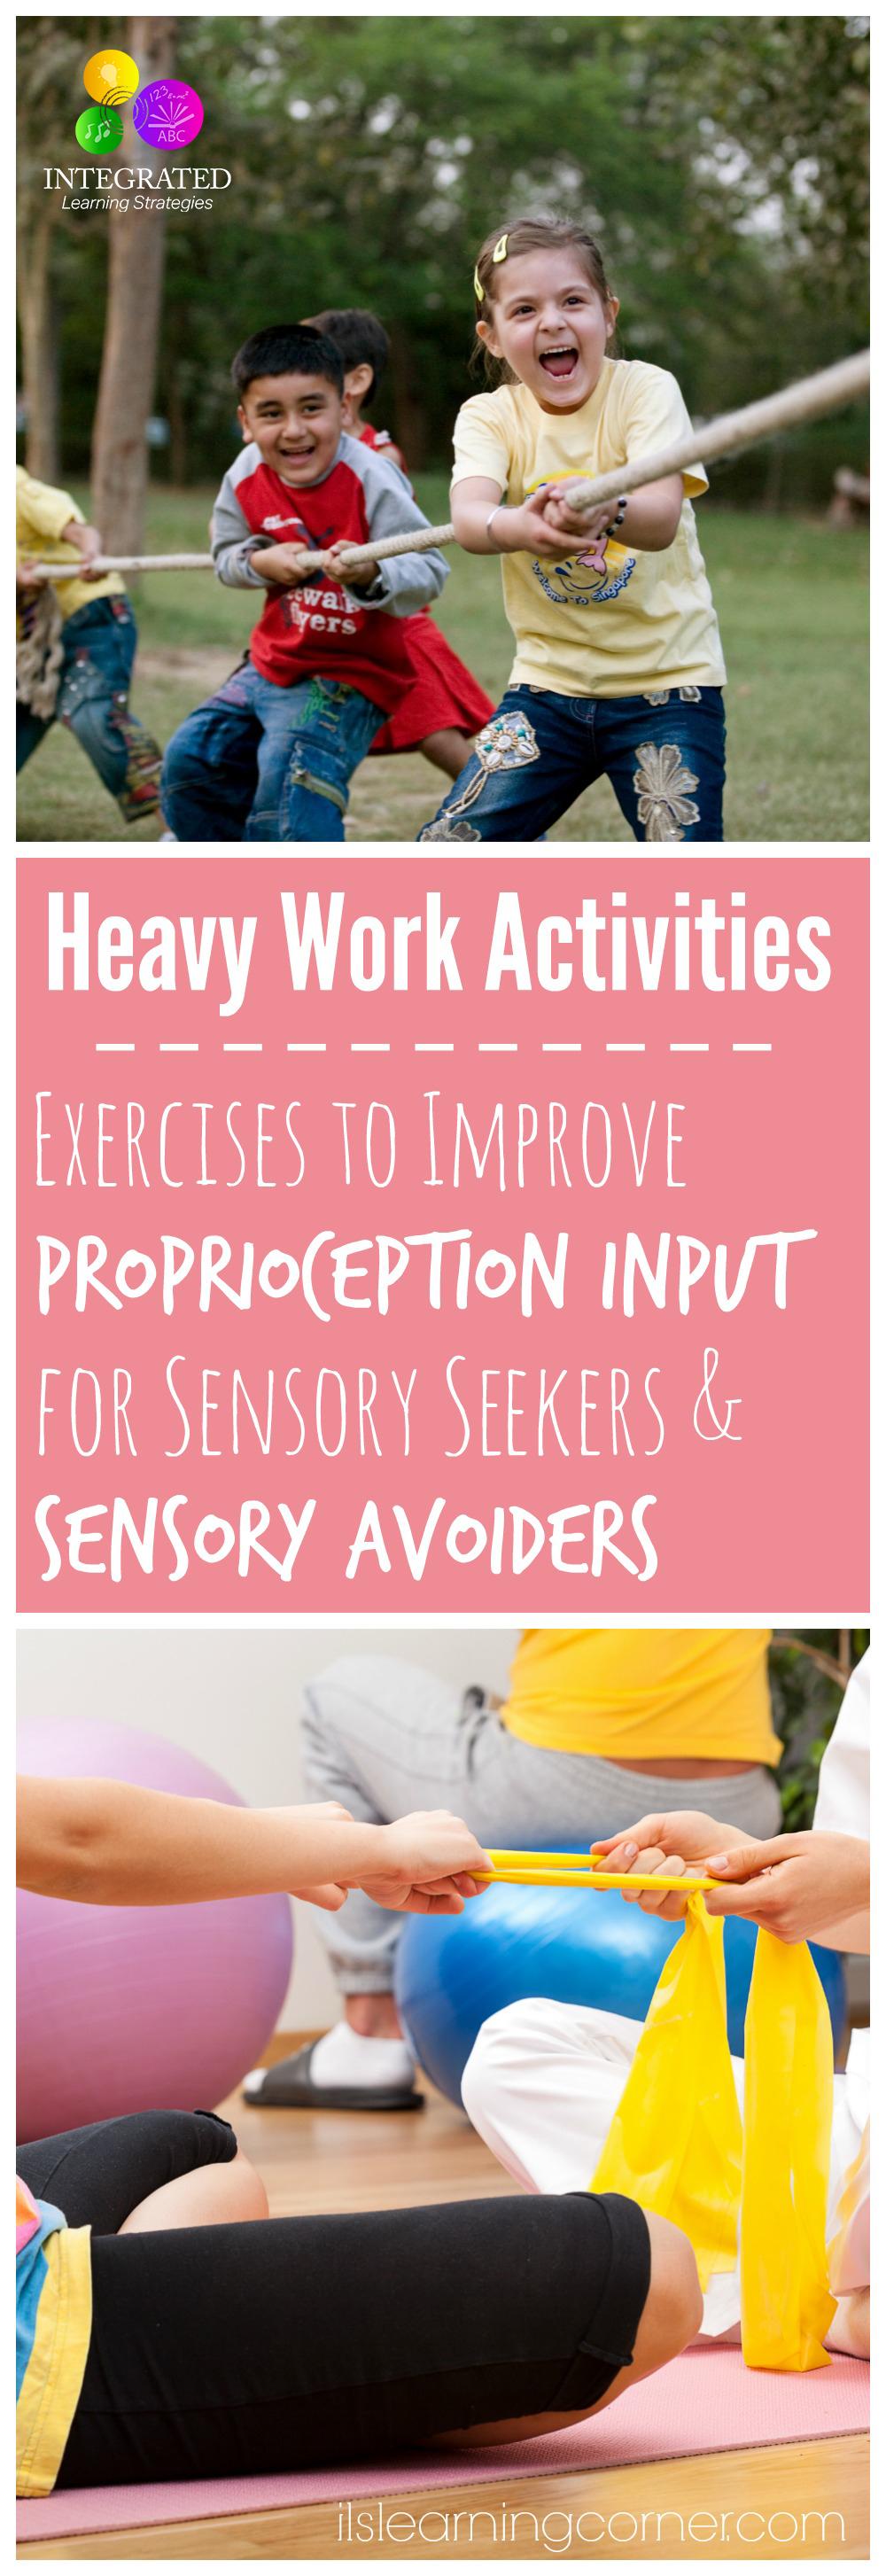 Heavy Work Activities Prevent Proprioceptive Dysfunction